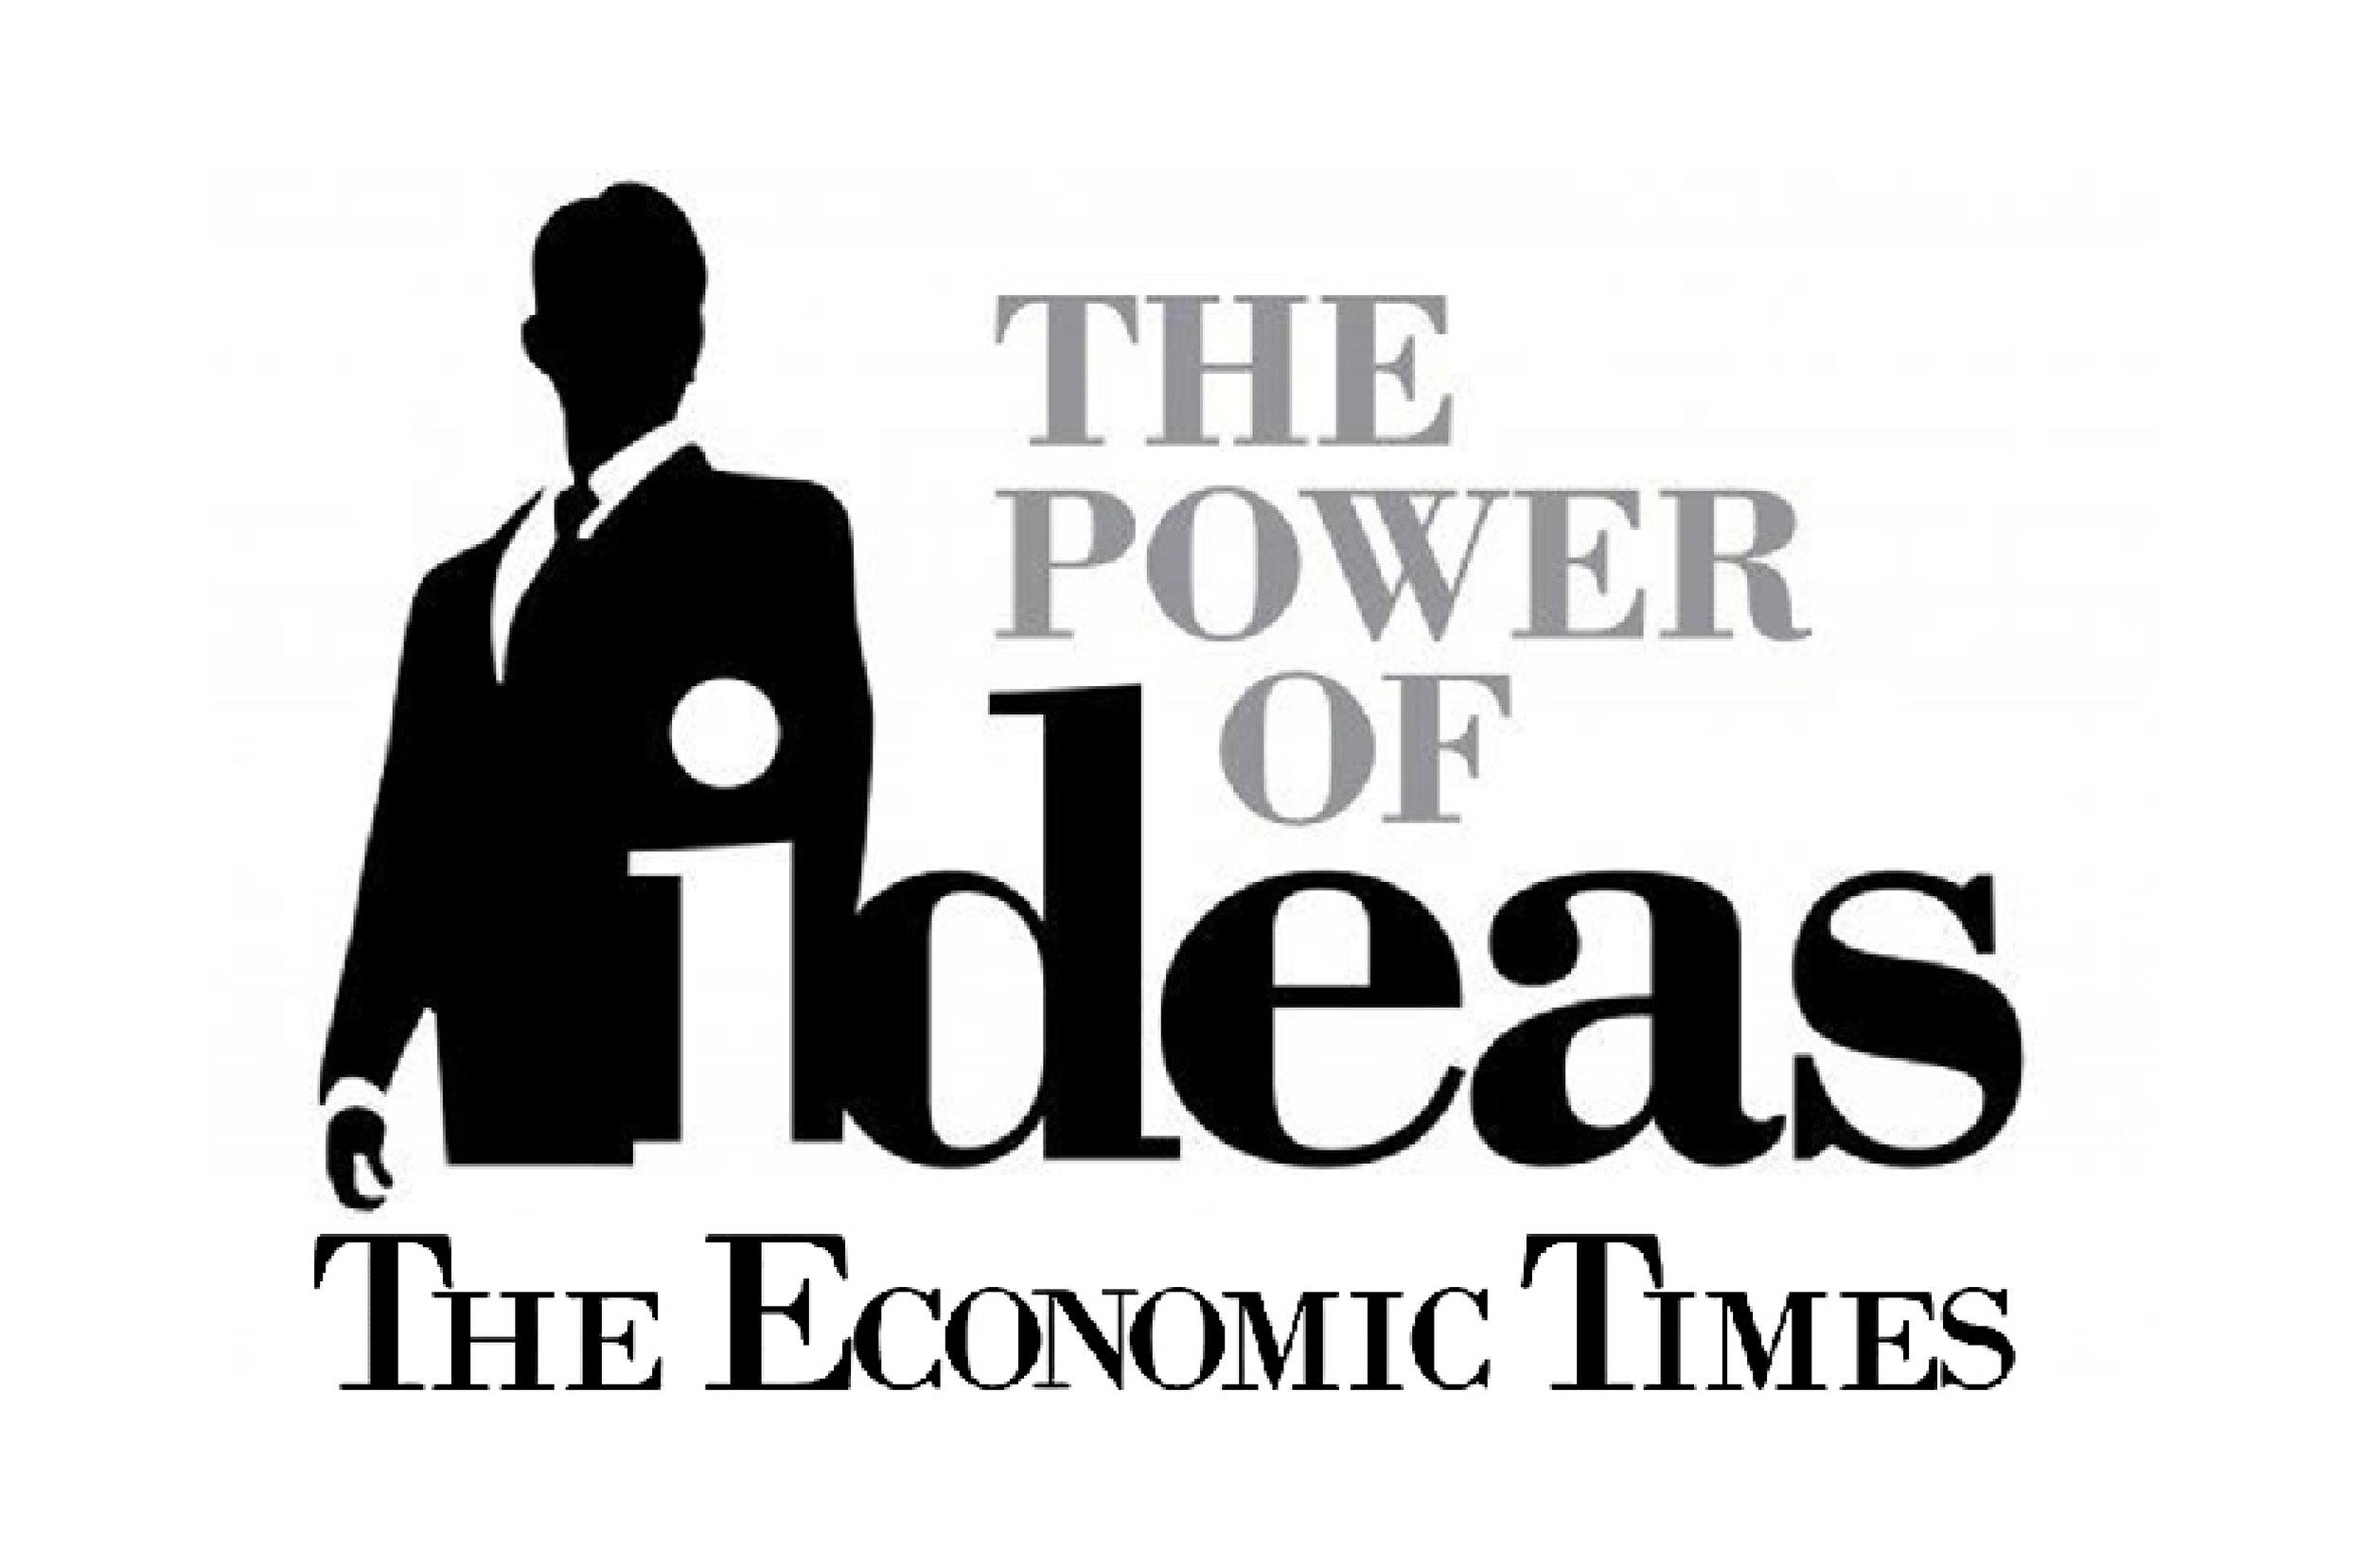 Economics Times Power of Ideas_Elephant Design_Pune, Singapore.jpg